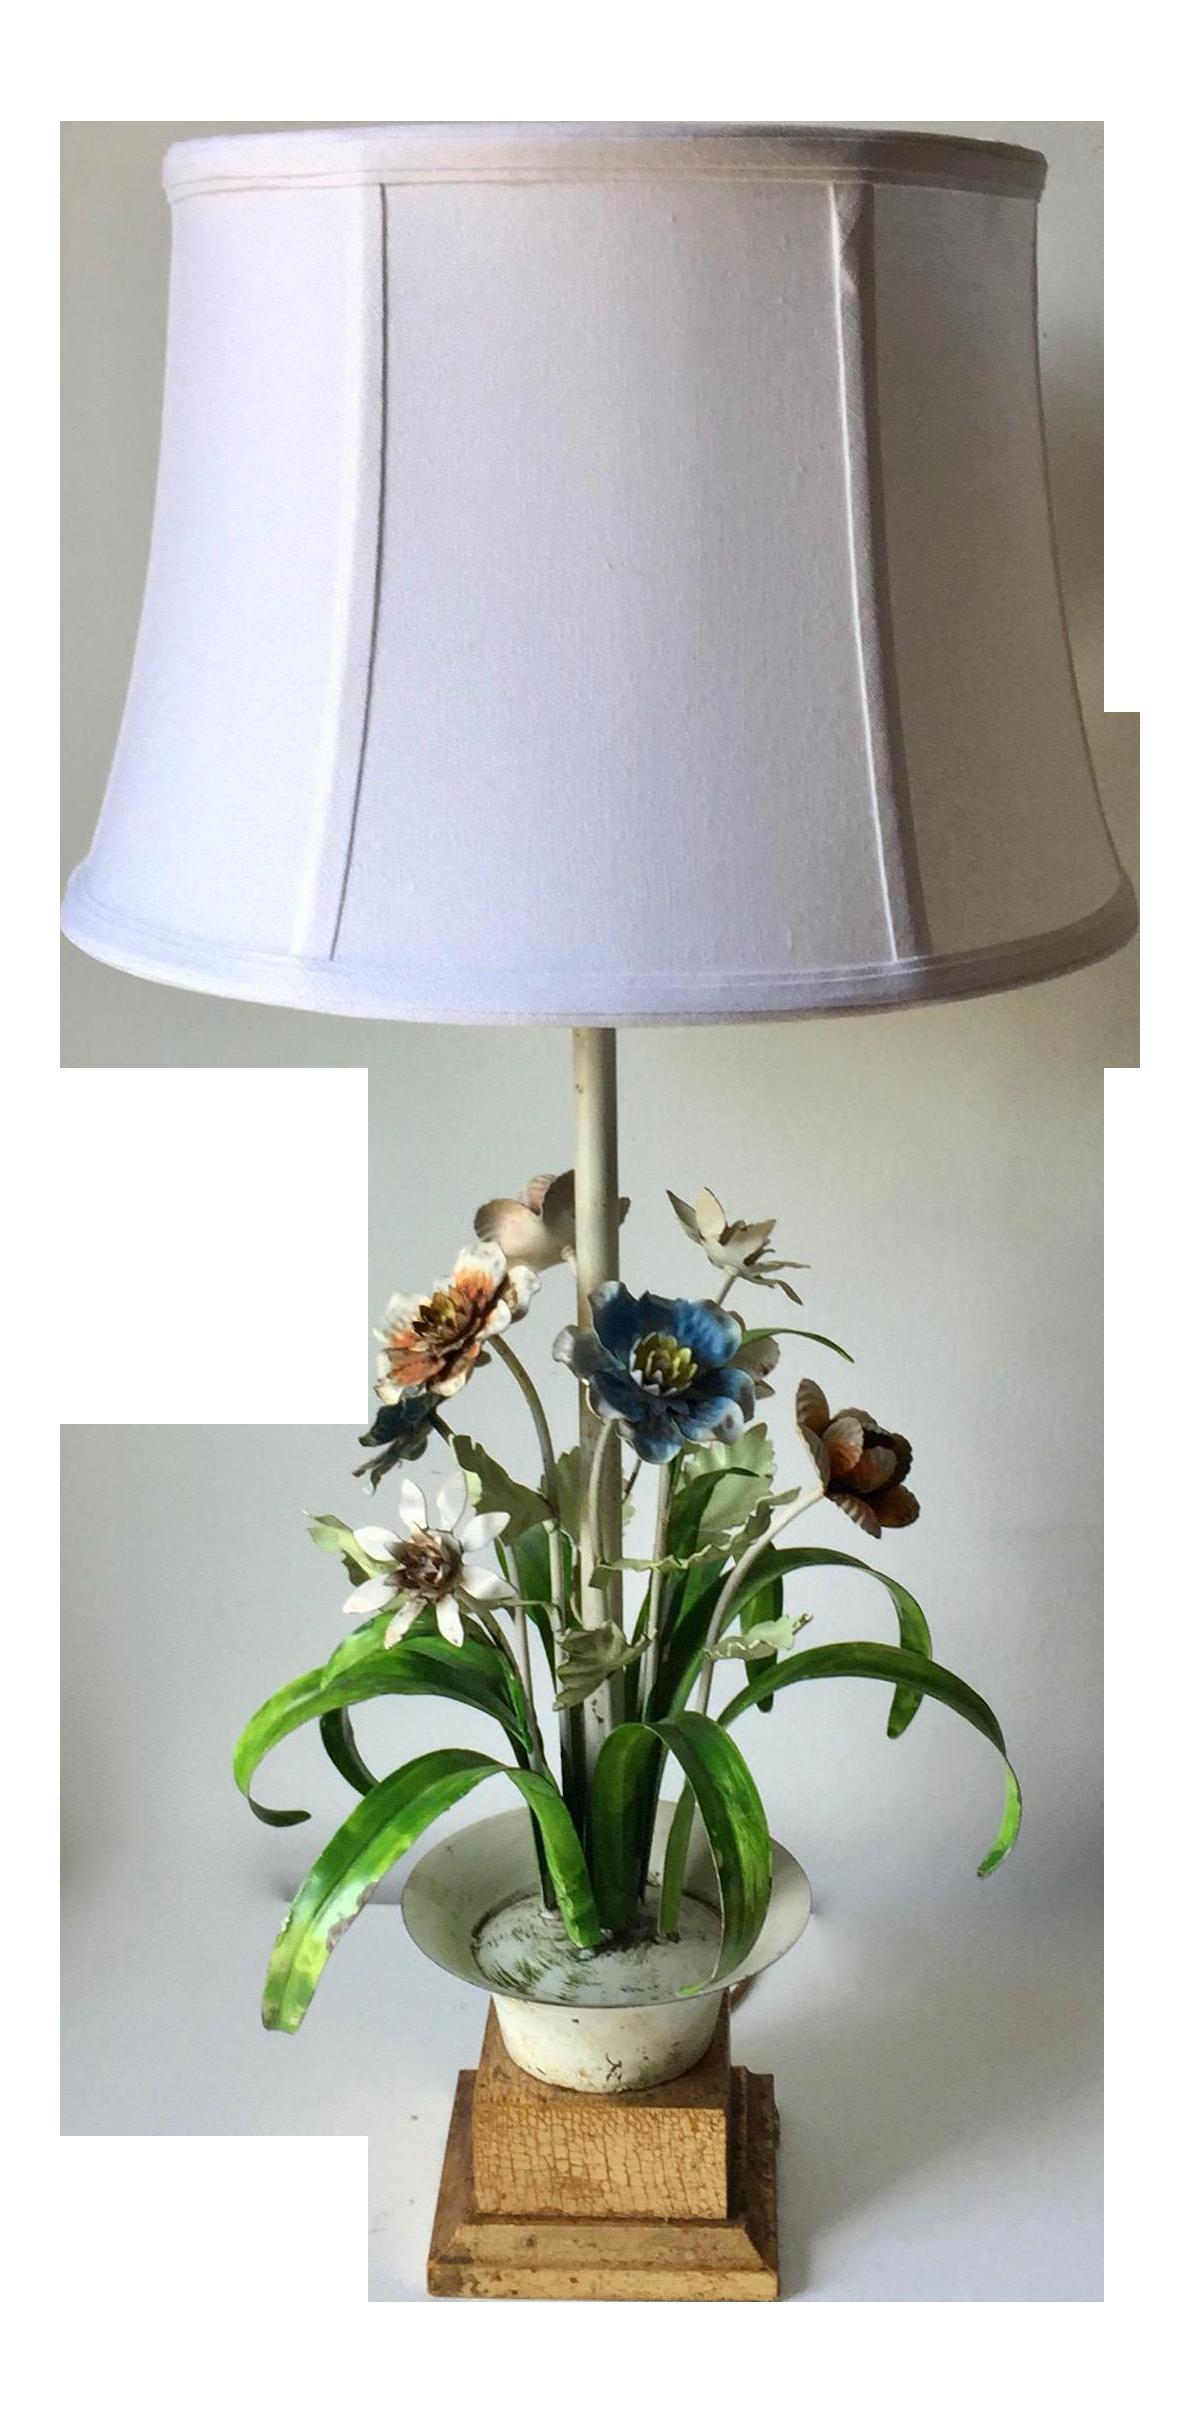 VTG Tole Painted Metal Italian Table Flower Lamp Mid Century White Blue Green